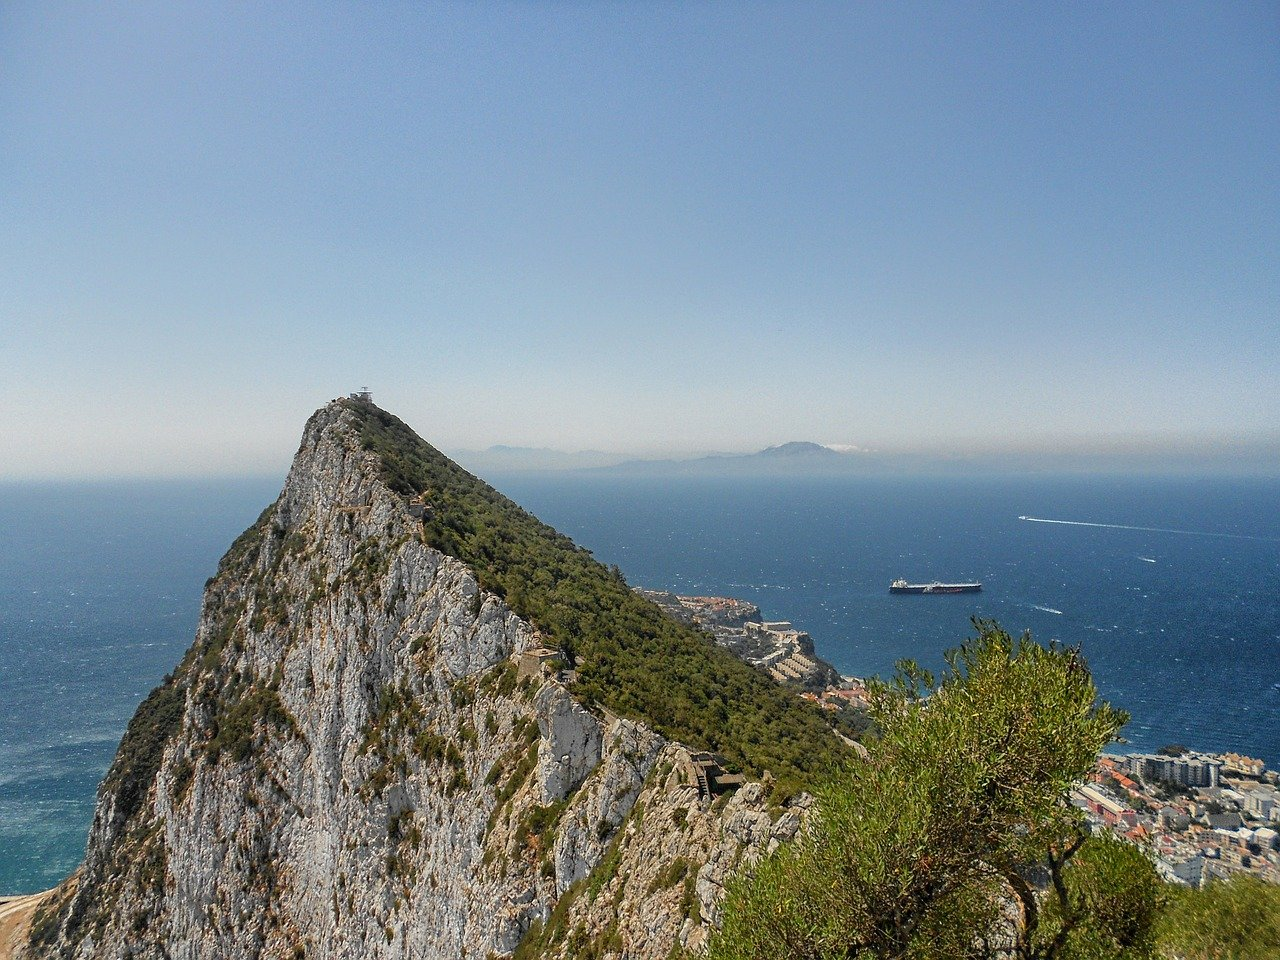 Poem: You're My Rock of Gibraltar